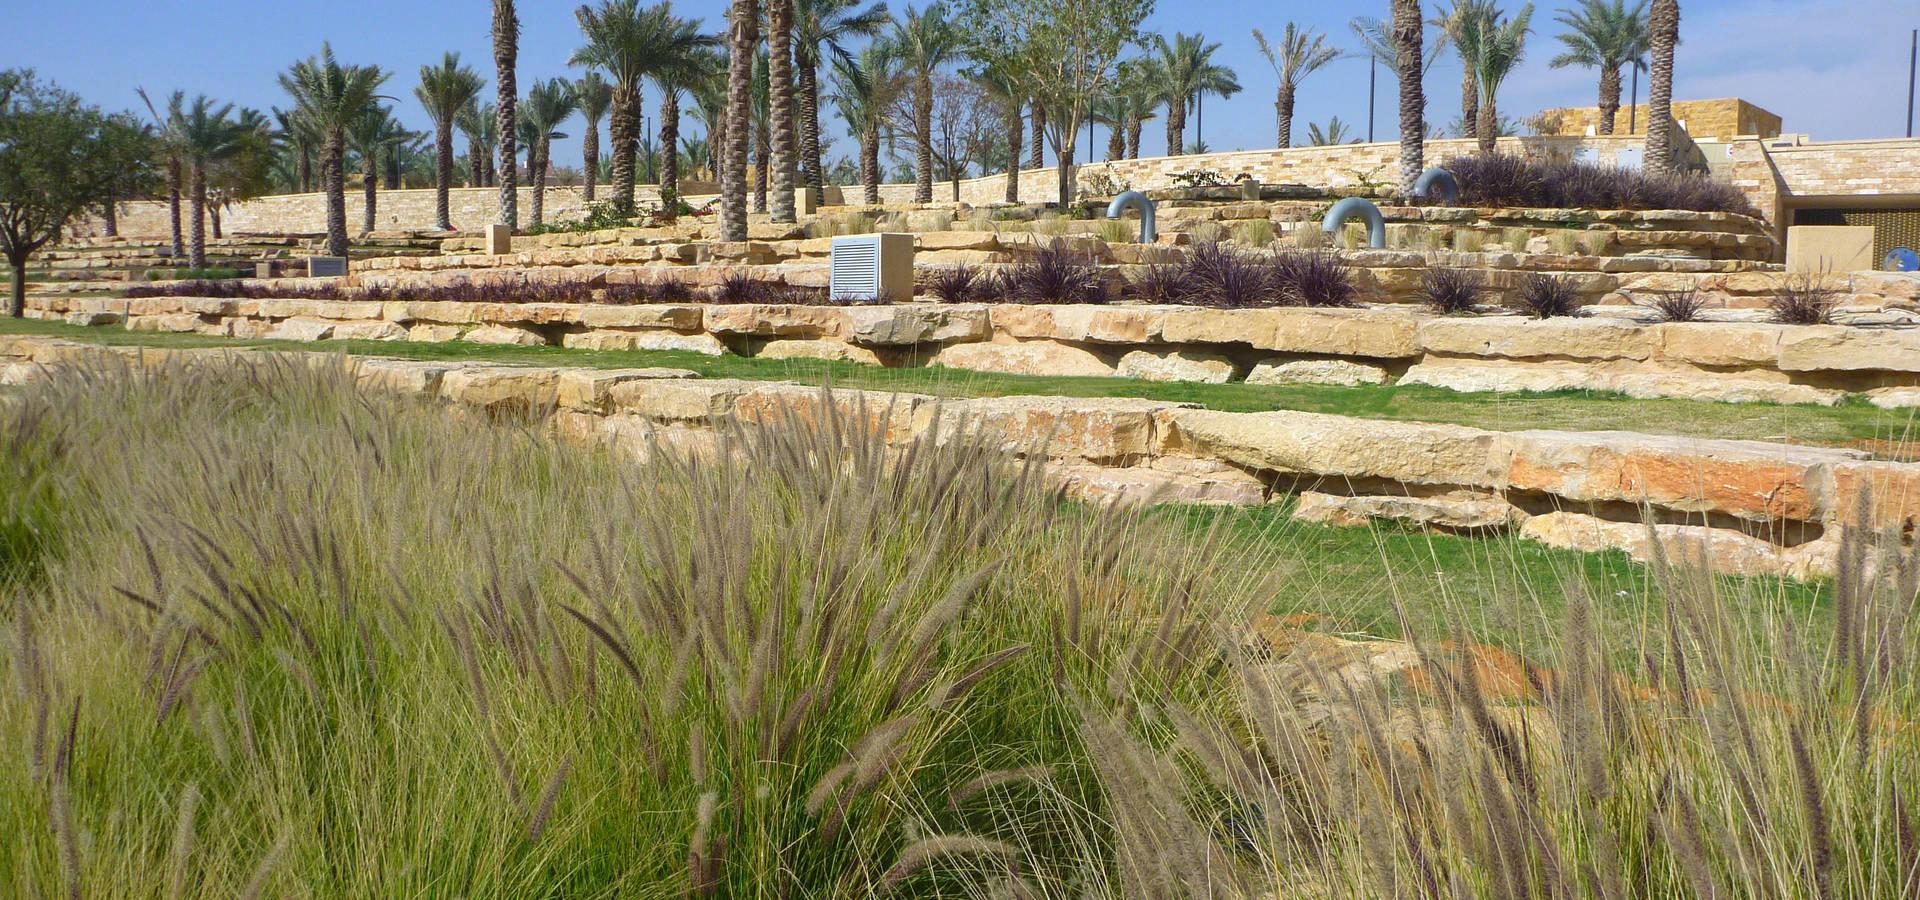 MK2 international landscape architects